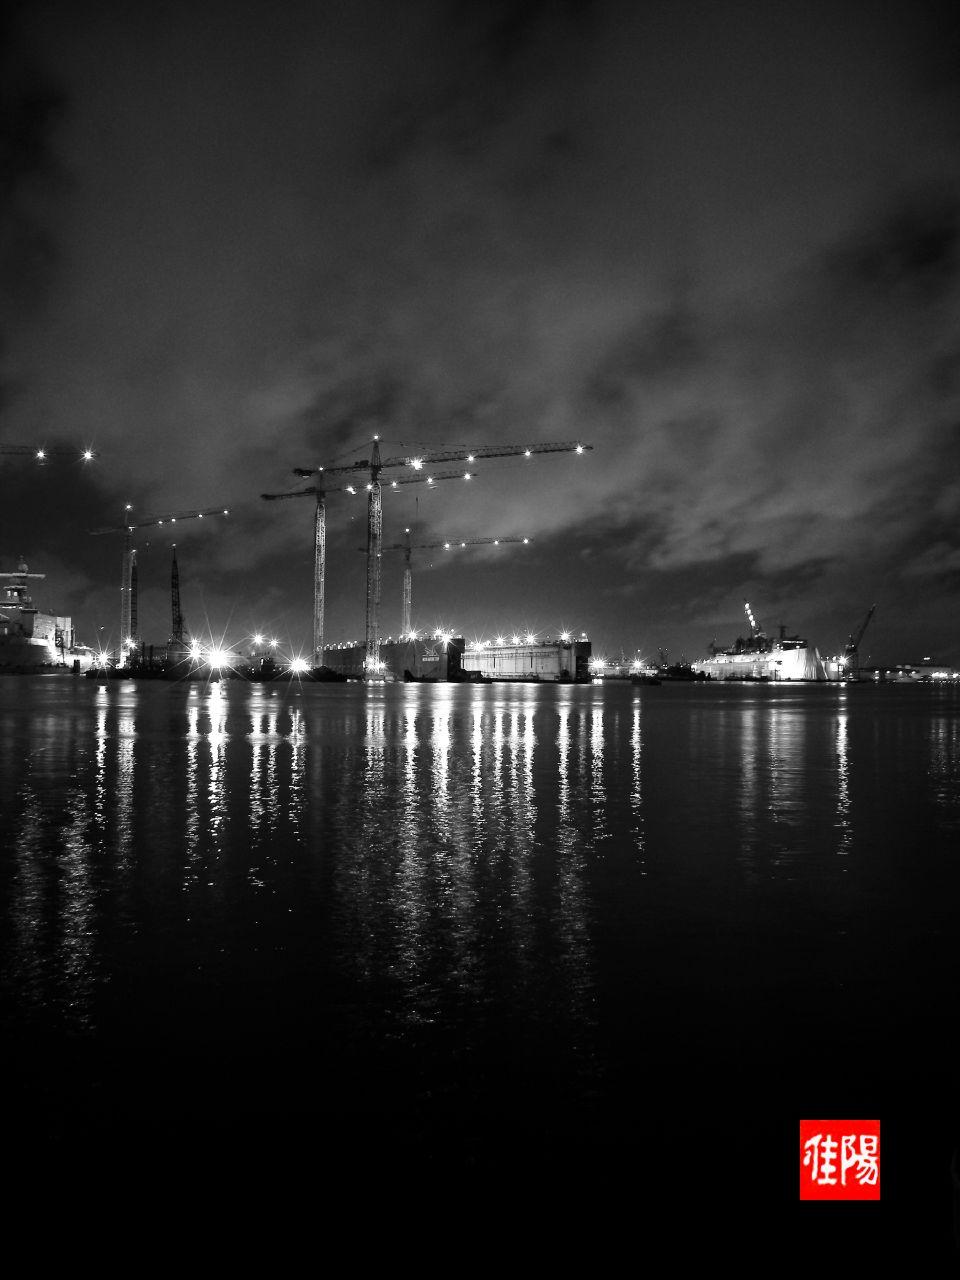 P80-Orf_ShipyardNight01_2009-09_13A